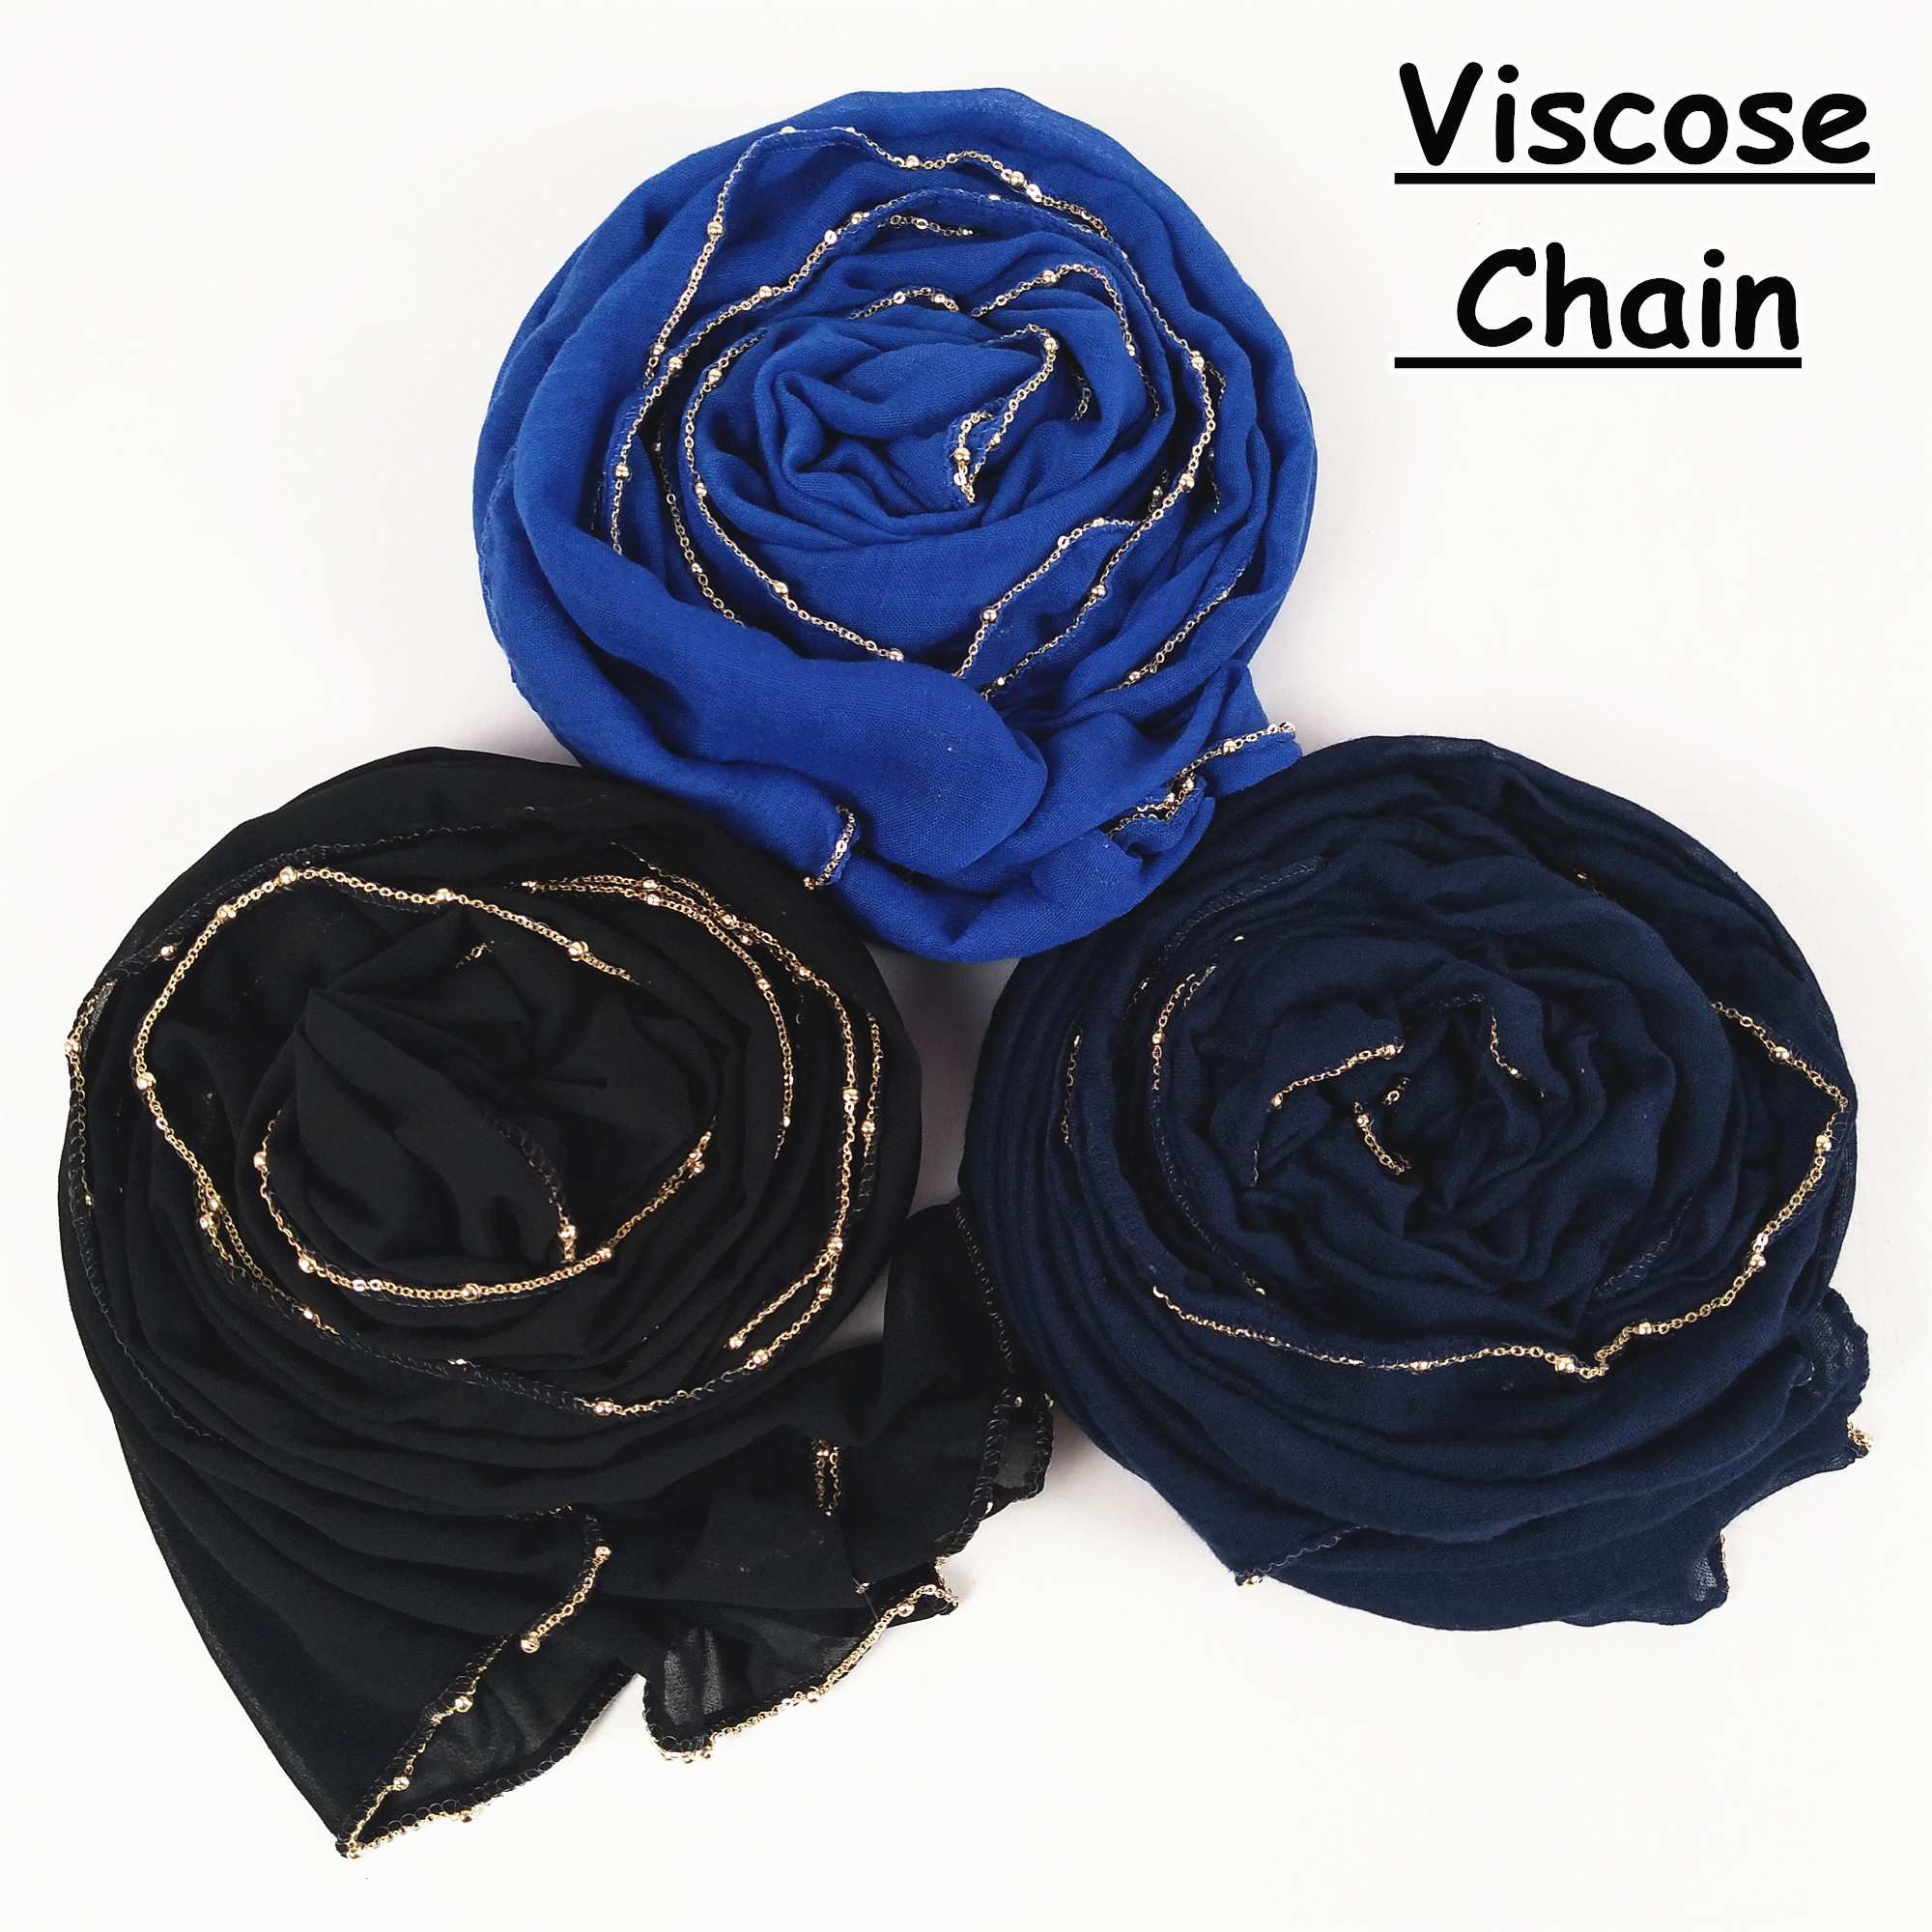 M34 1pcs High quality gold chain viscose hijab   scarf   women shawl lady   wrap   headband 180*85cm 10pcs/lot